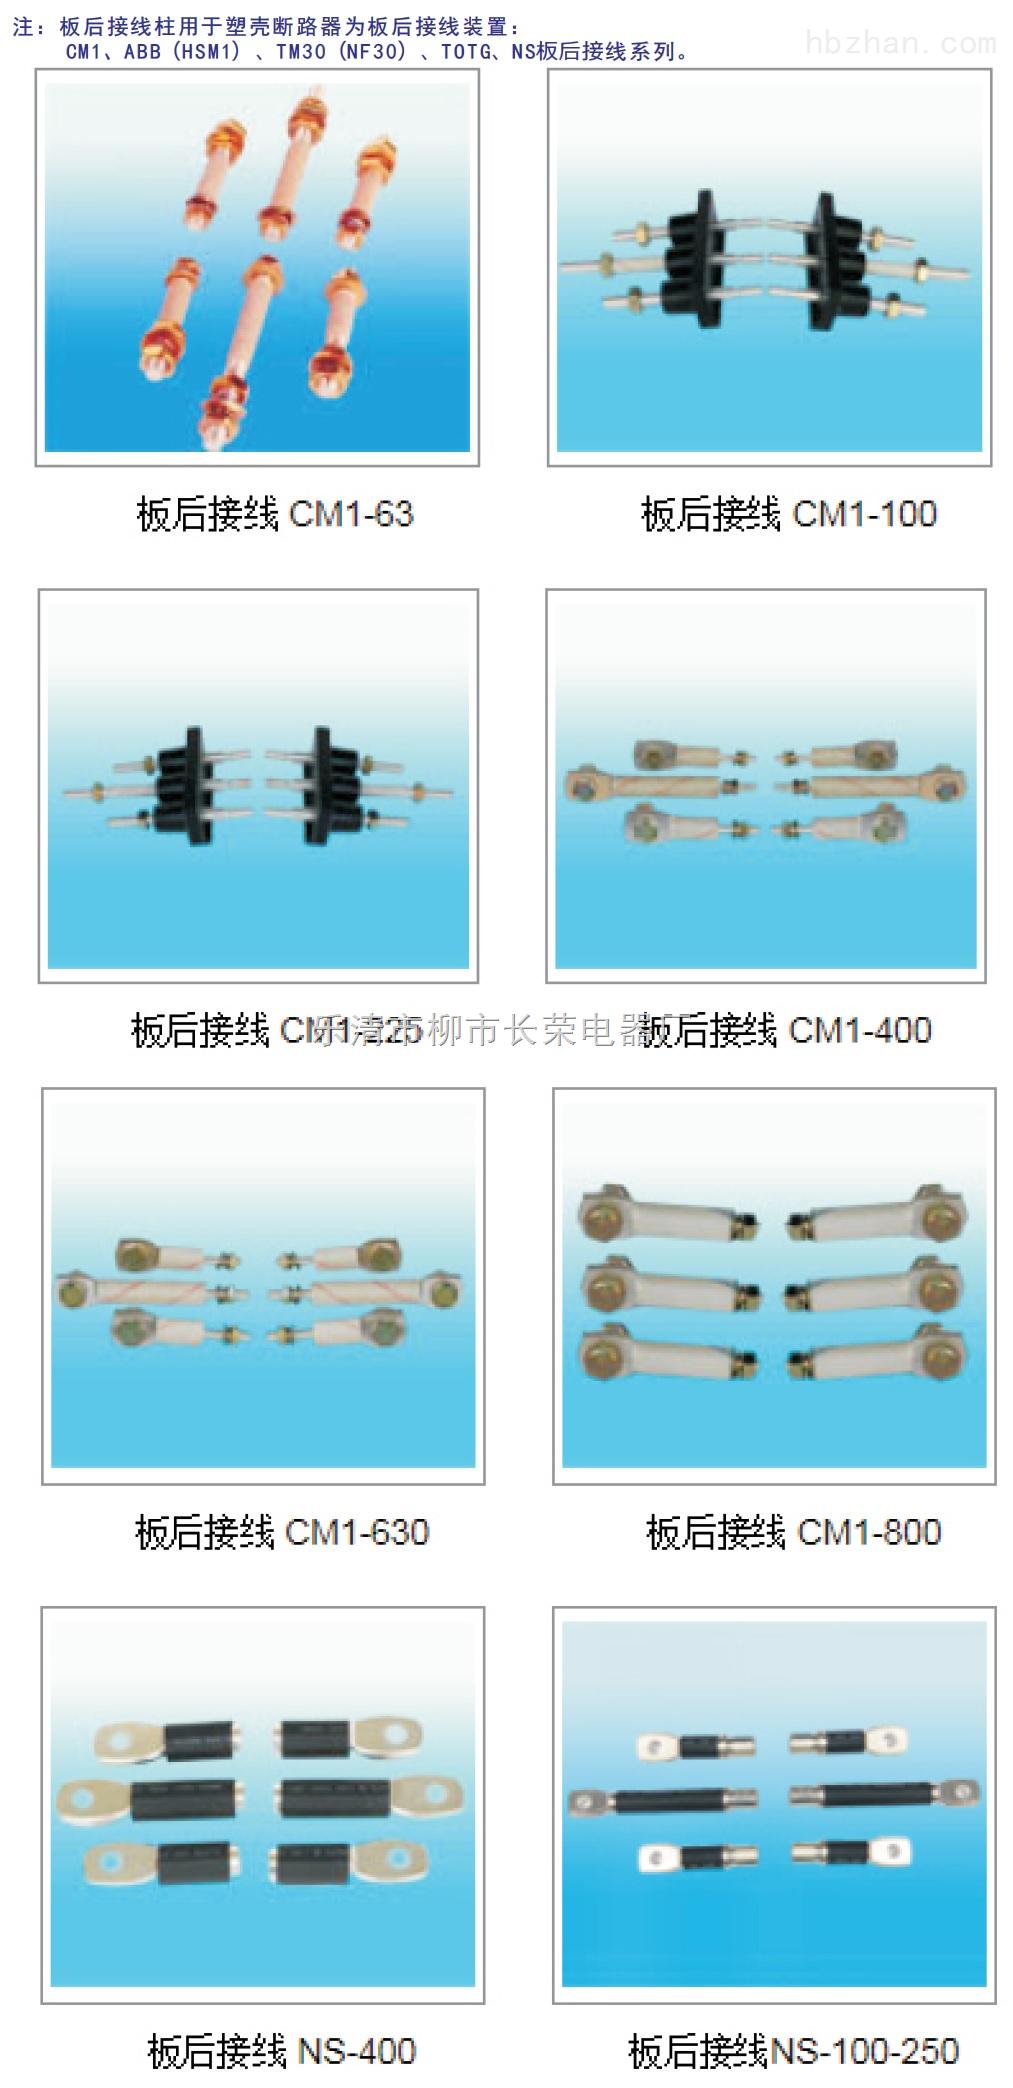 nm1-630s/3300【板后接线装置】cm1-630s/3300【】dz20j-630/3300